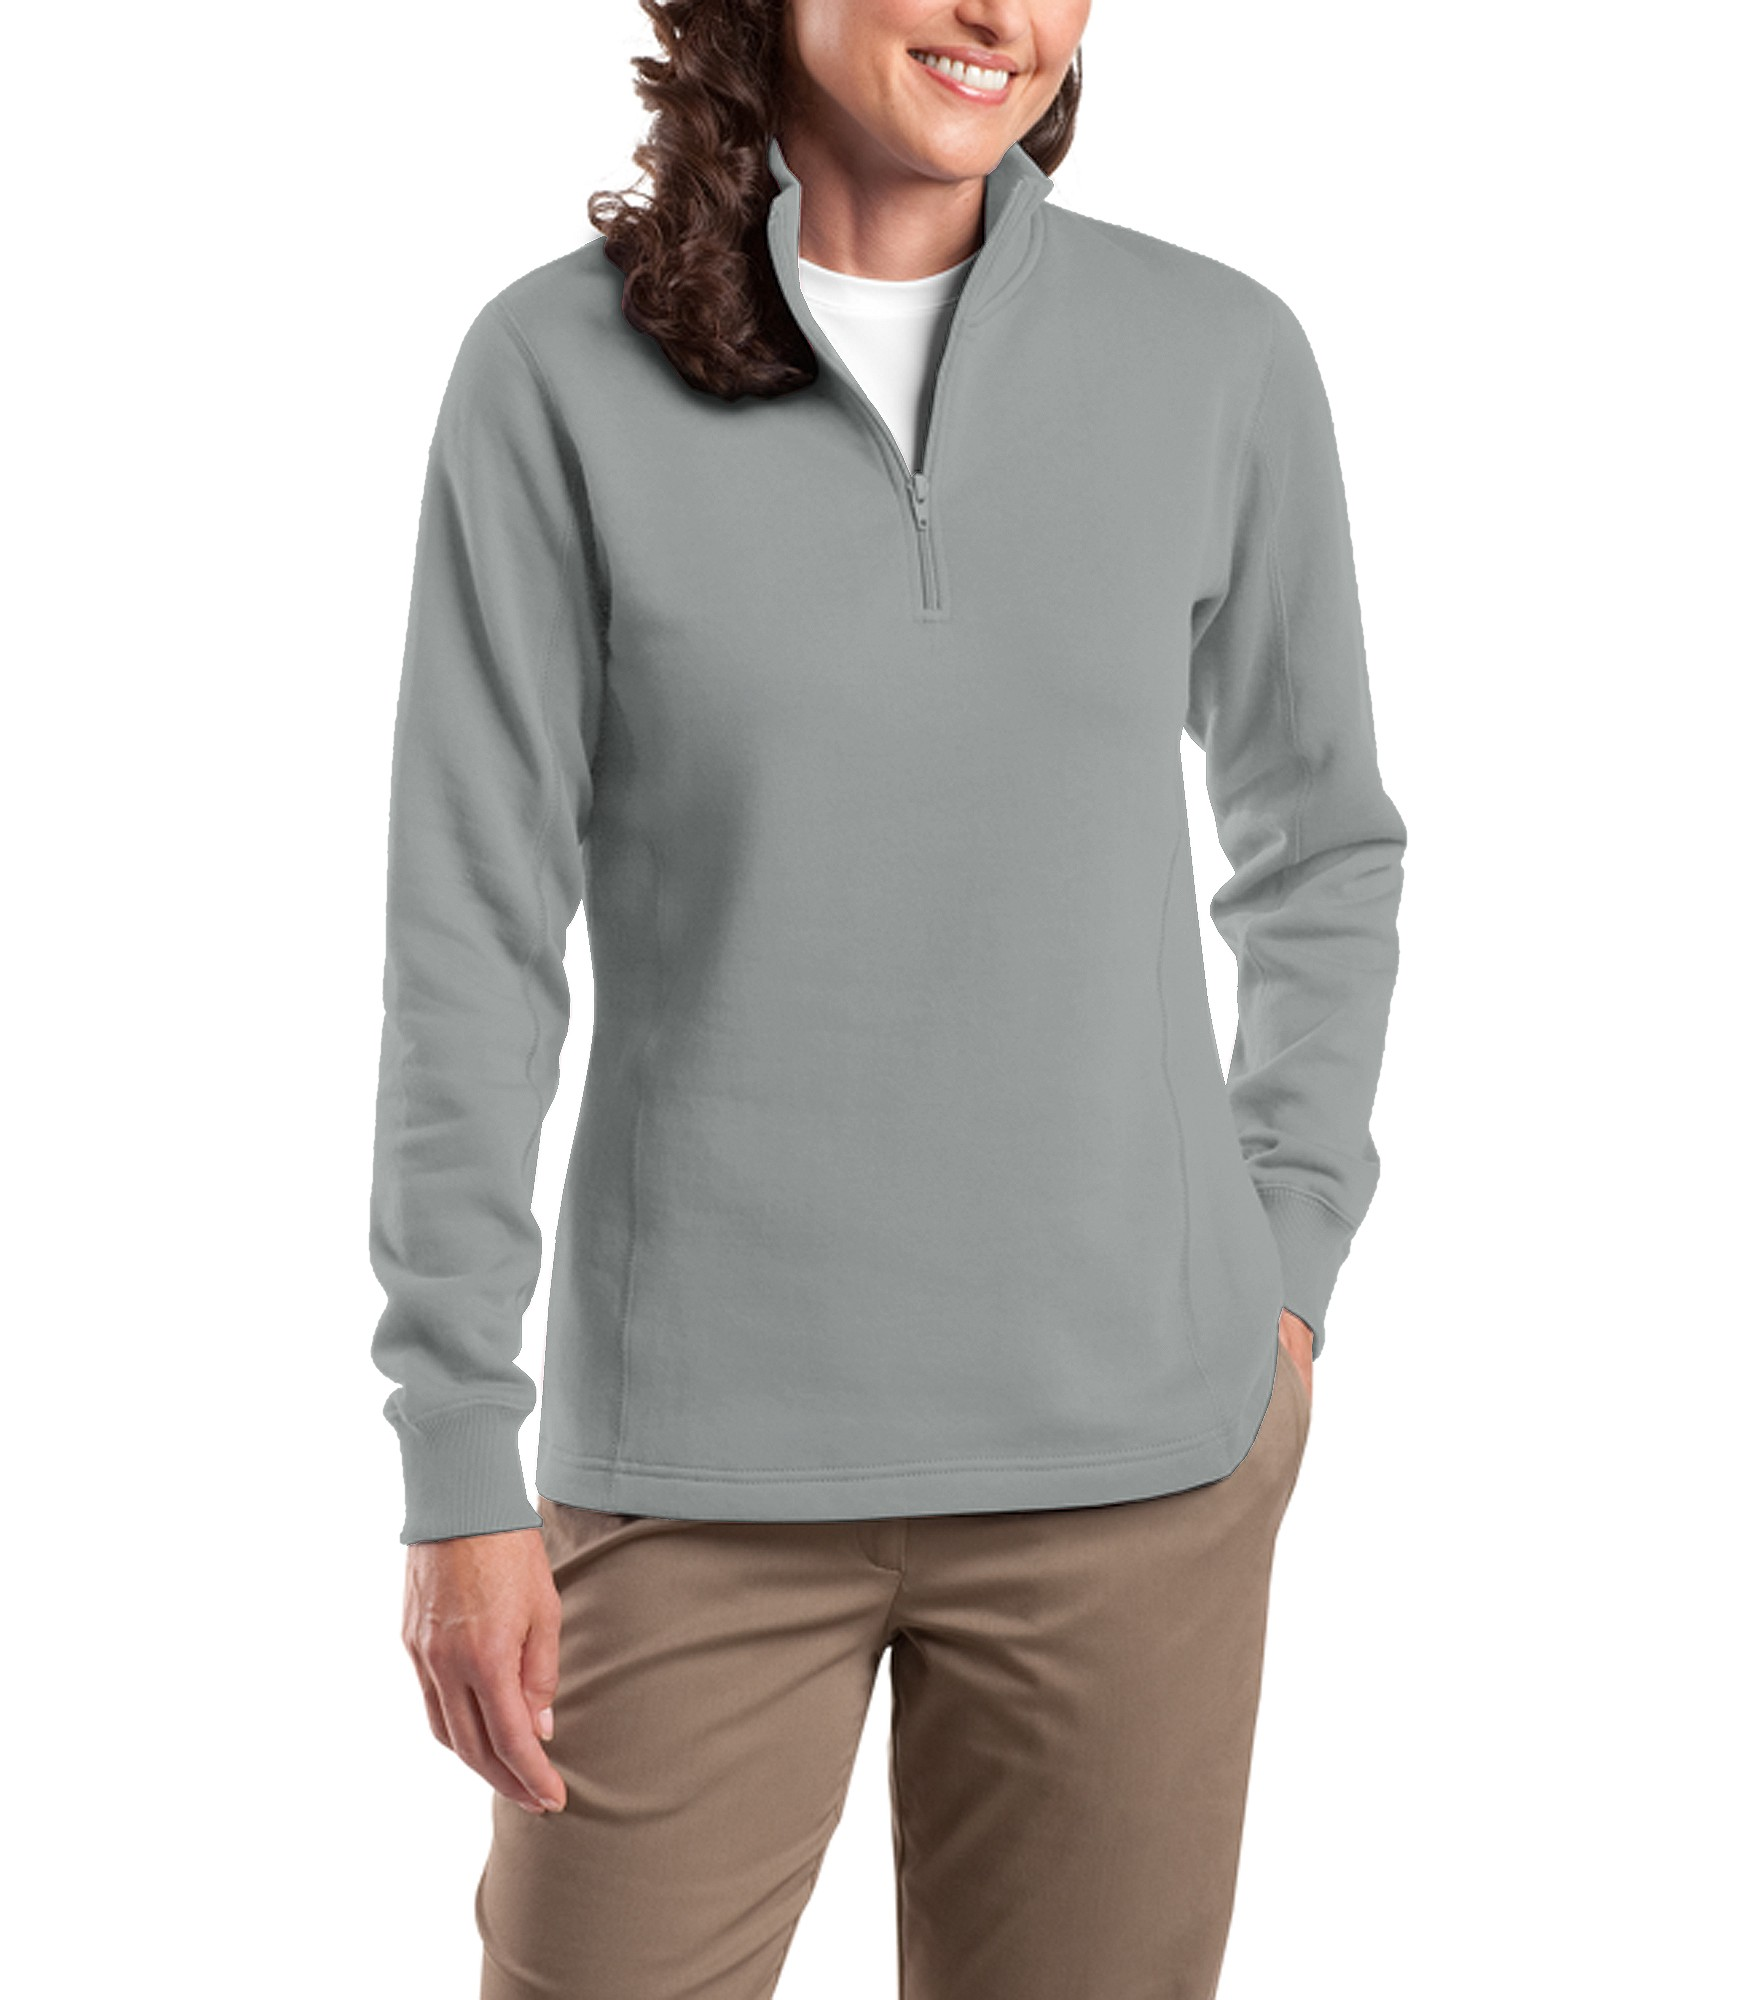 Growth Energy Sport Tek Ladies 1 4 Zip Sweatshirt A stylish feminine fit and flatlock stitching details make this sweatshirt stand out. growth energy sport tek ladies 1 4 zip sweatshirt